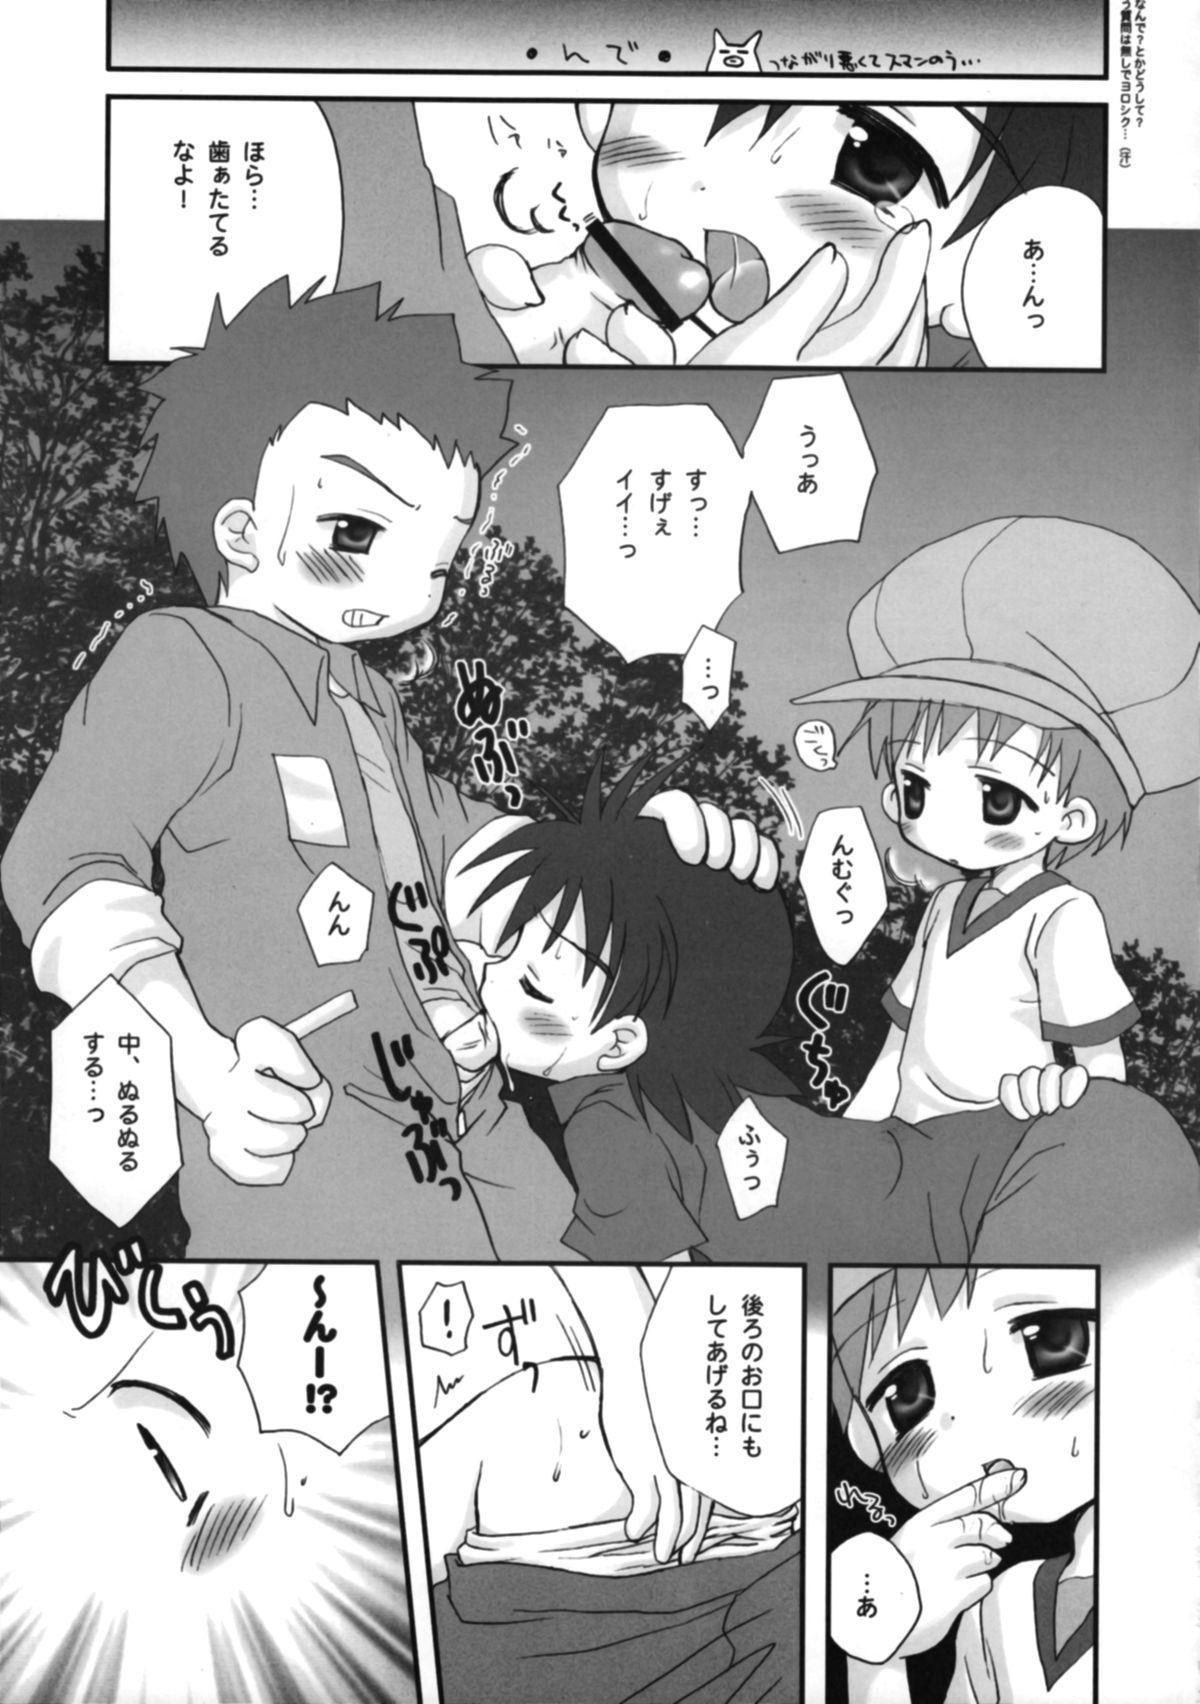 Takuya Kyun Gokkun Seishibori!! 9